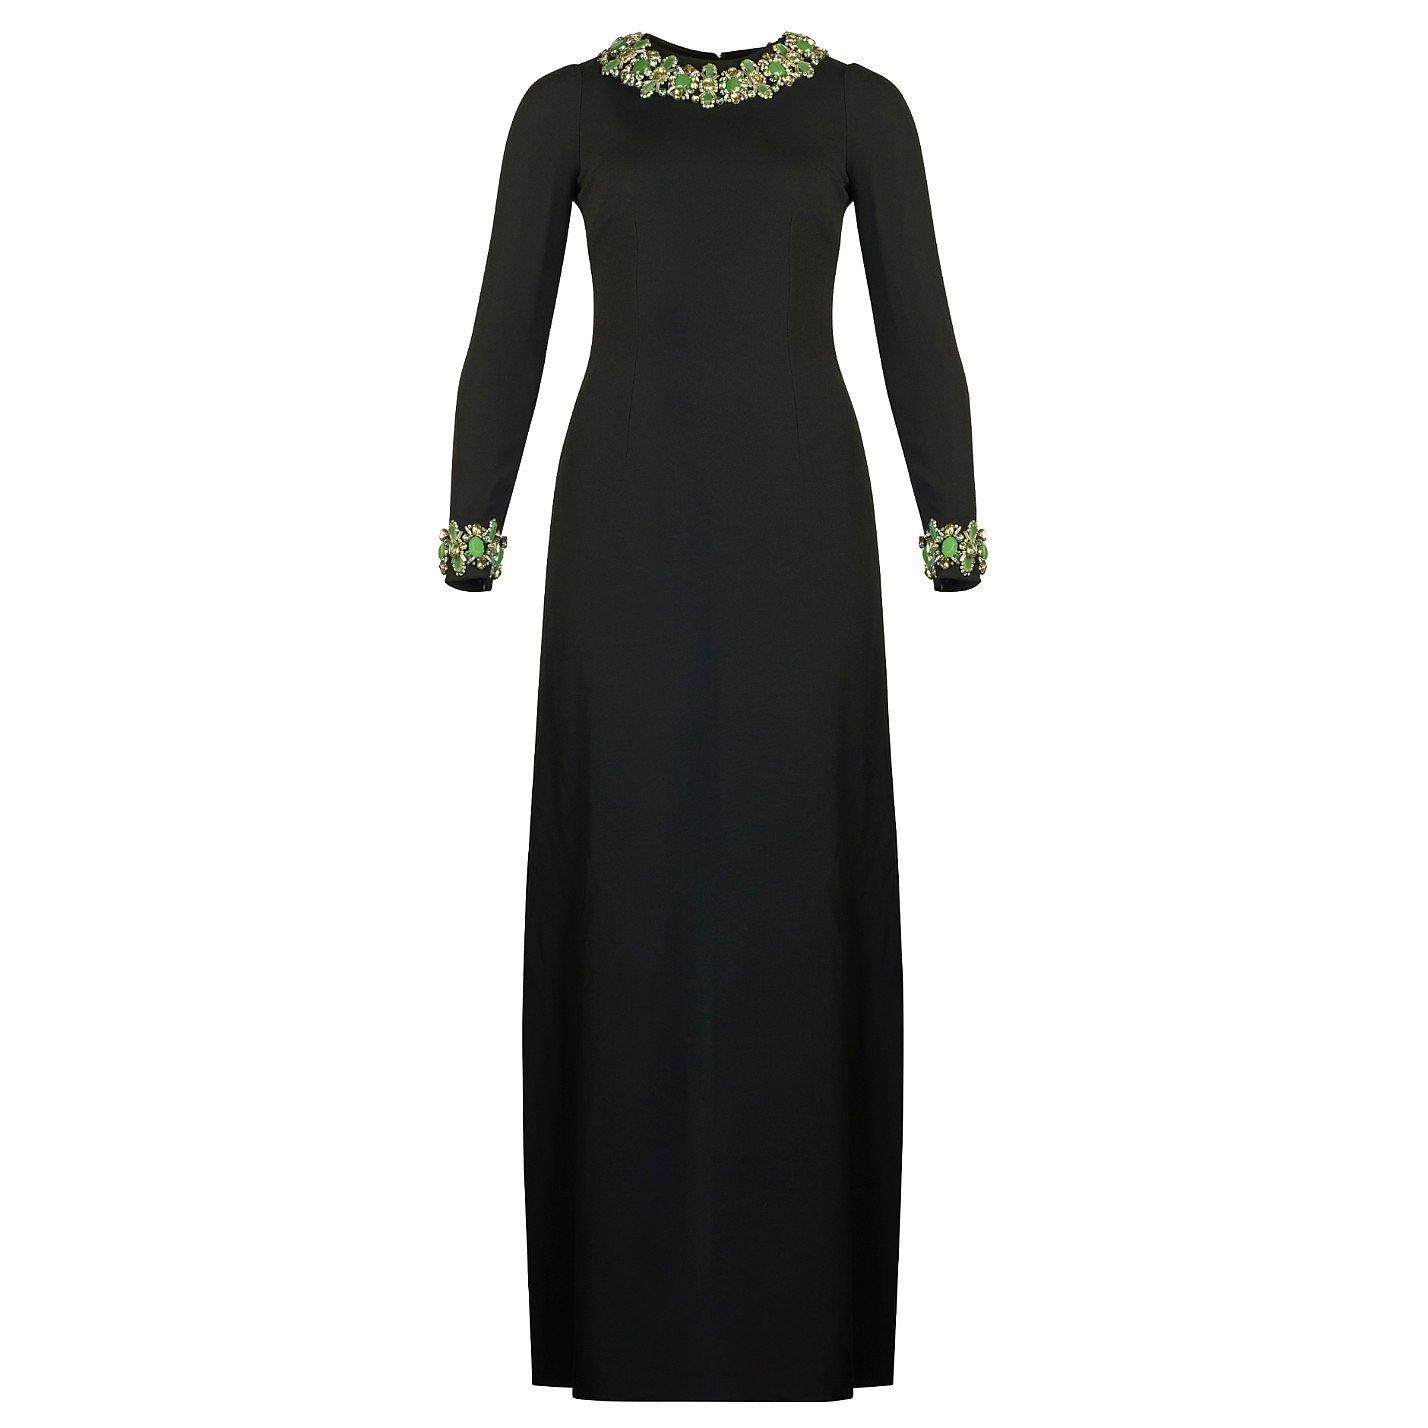 DOLCE & GABBANA Embellished Long Sleeved Gown